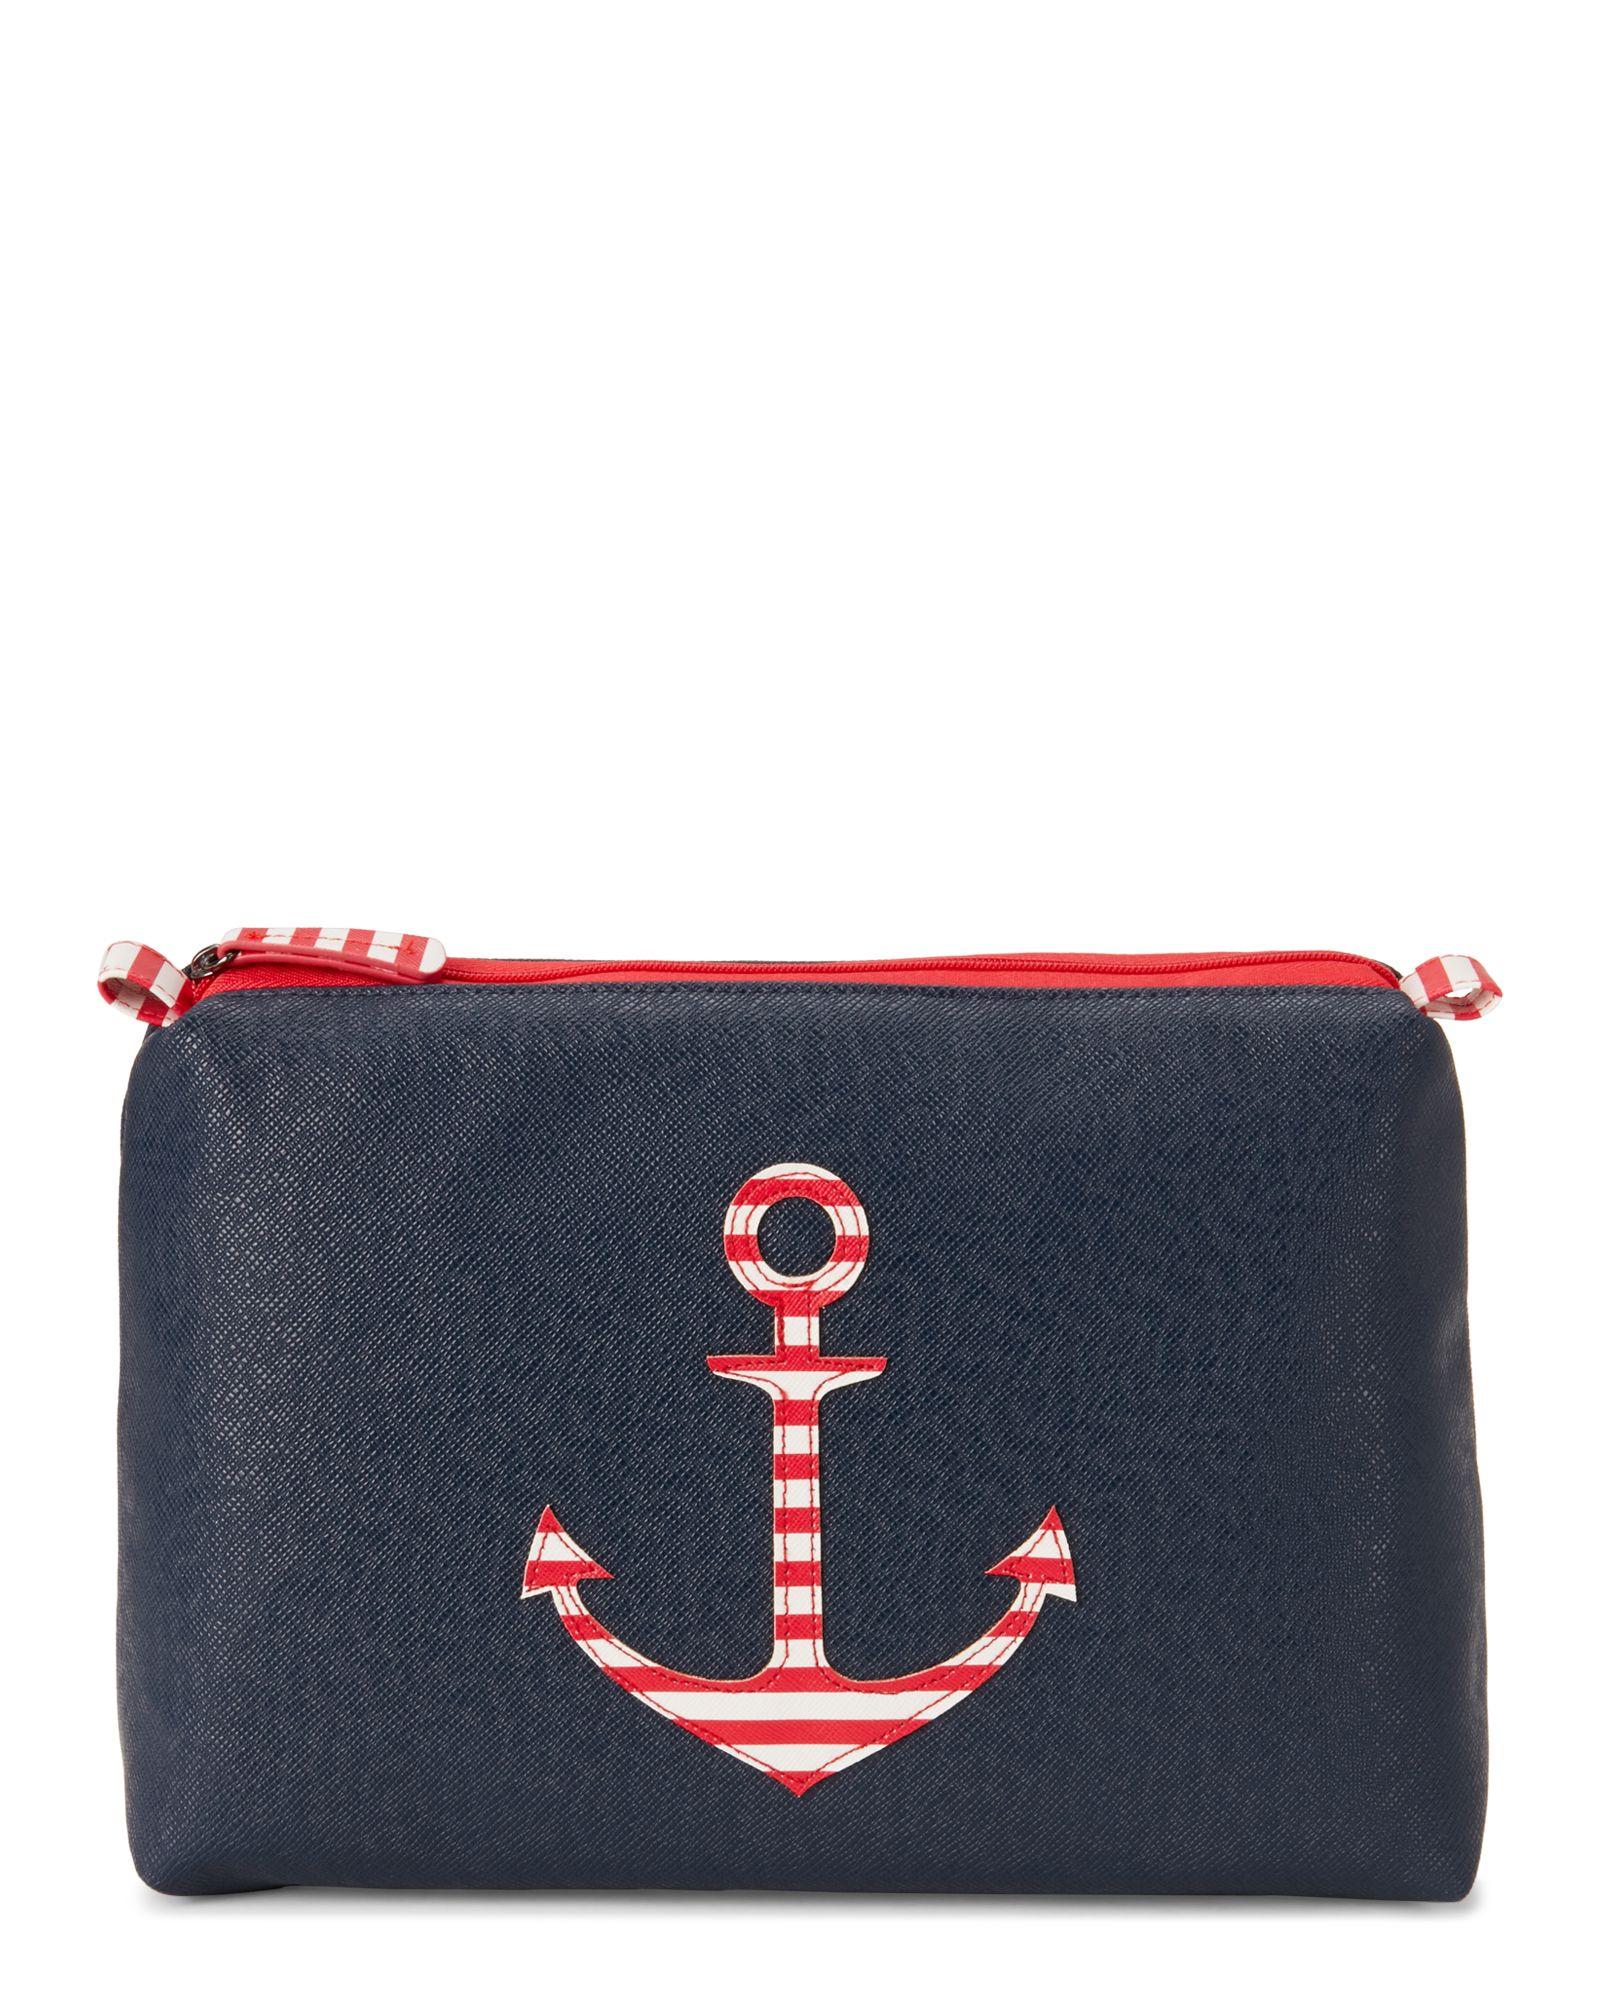 Stella & Max Large Anchors Away Cosmetic Bag